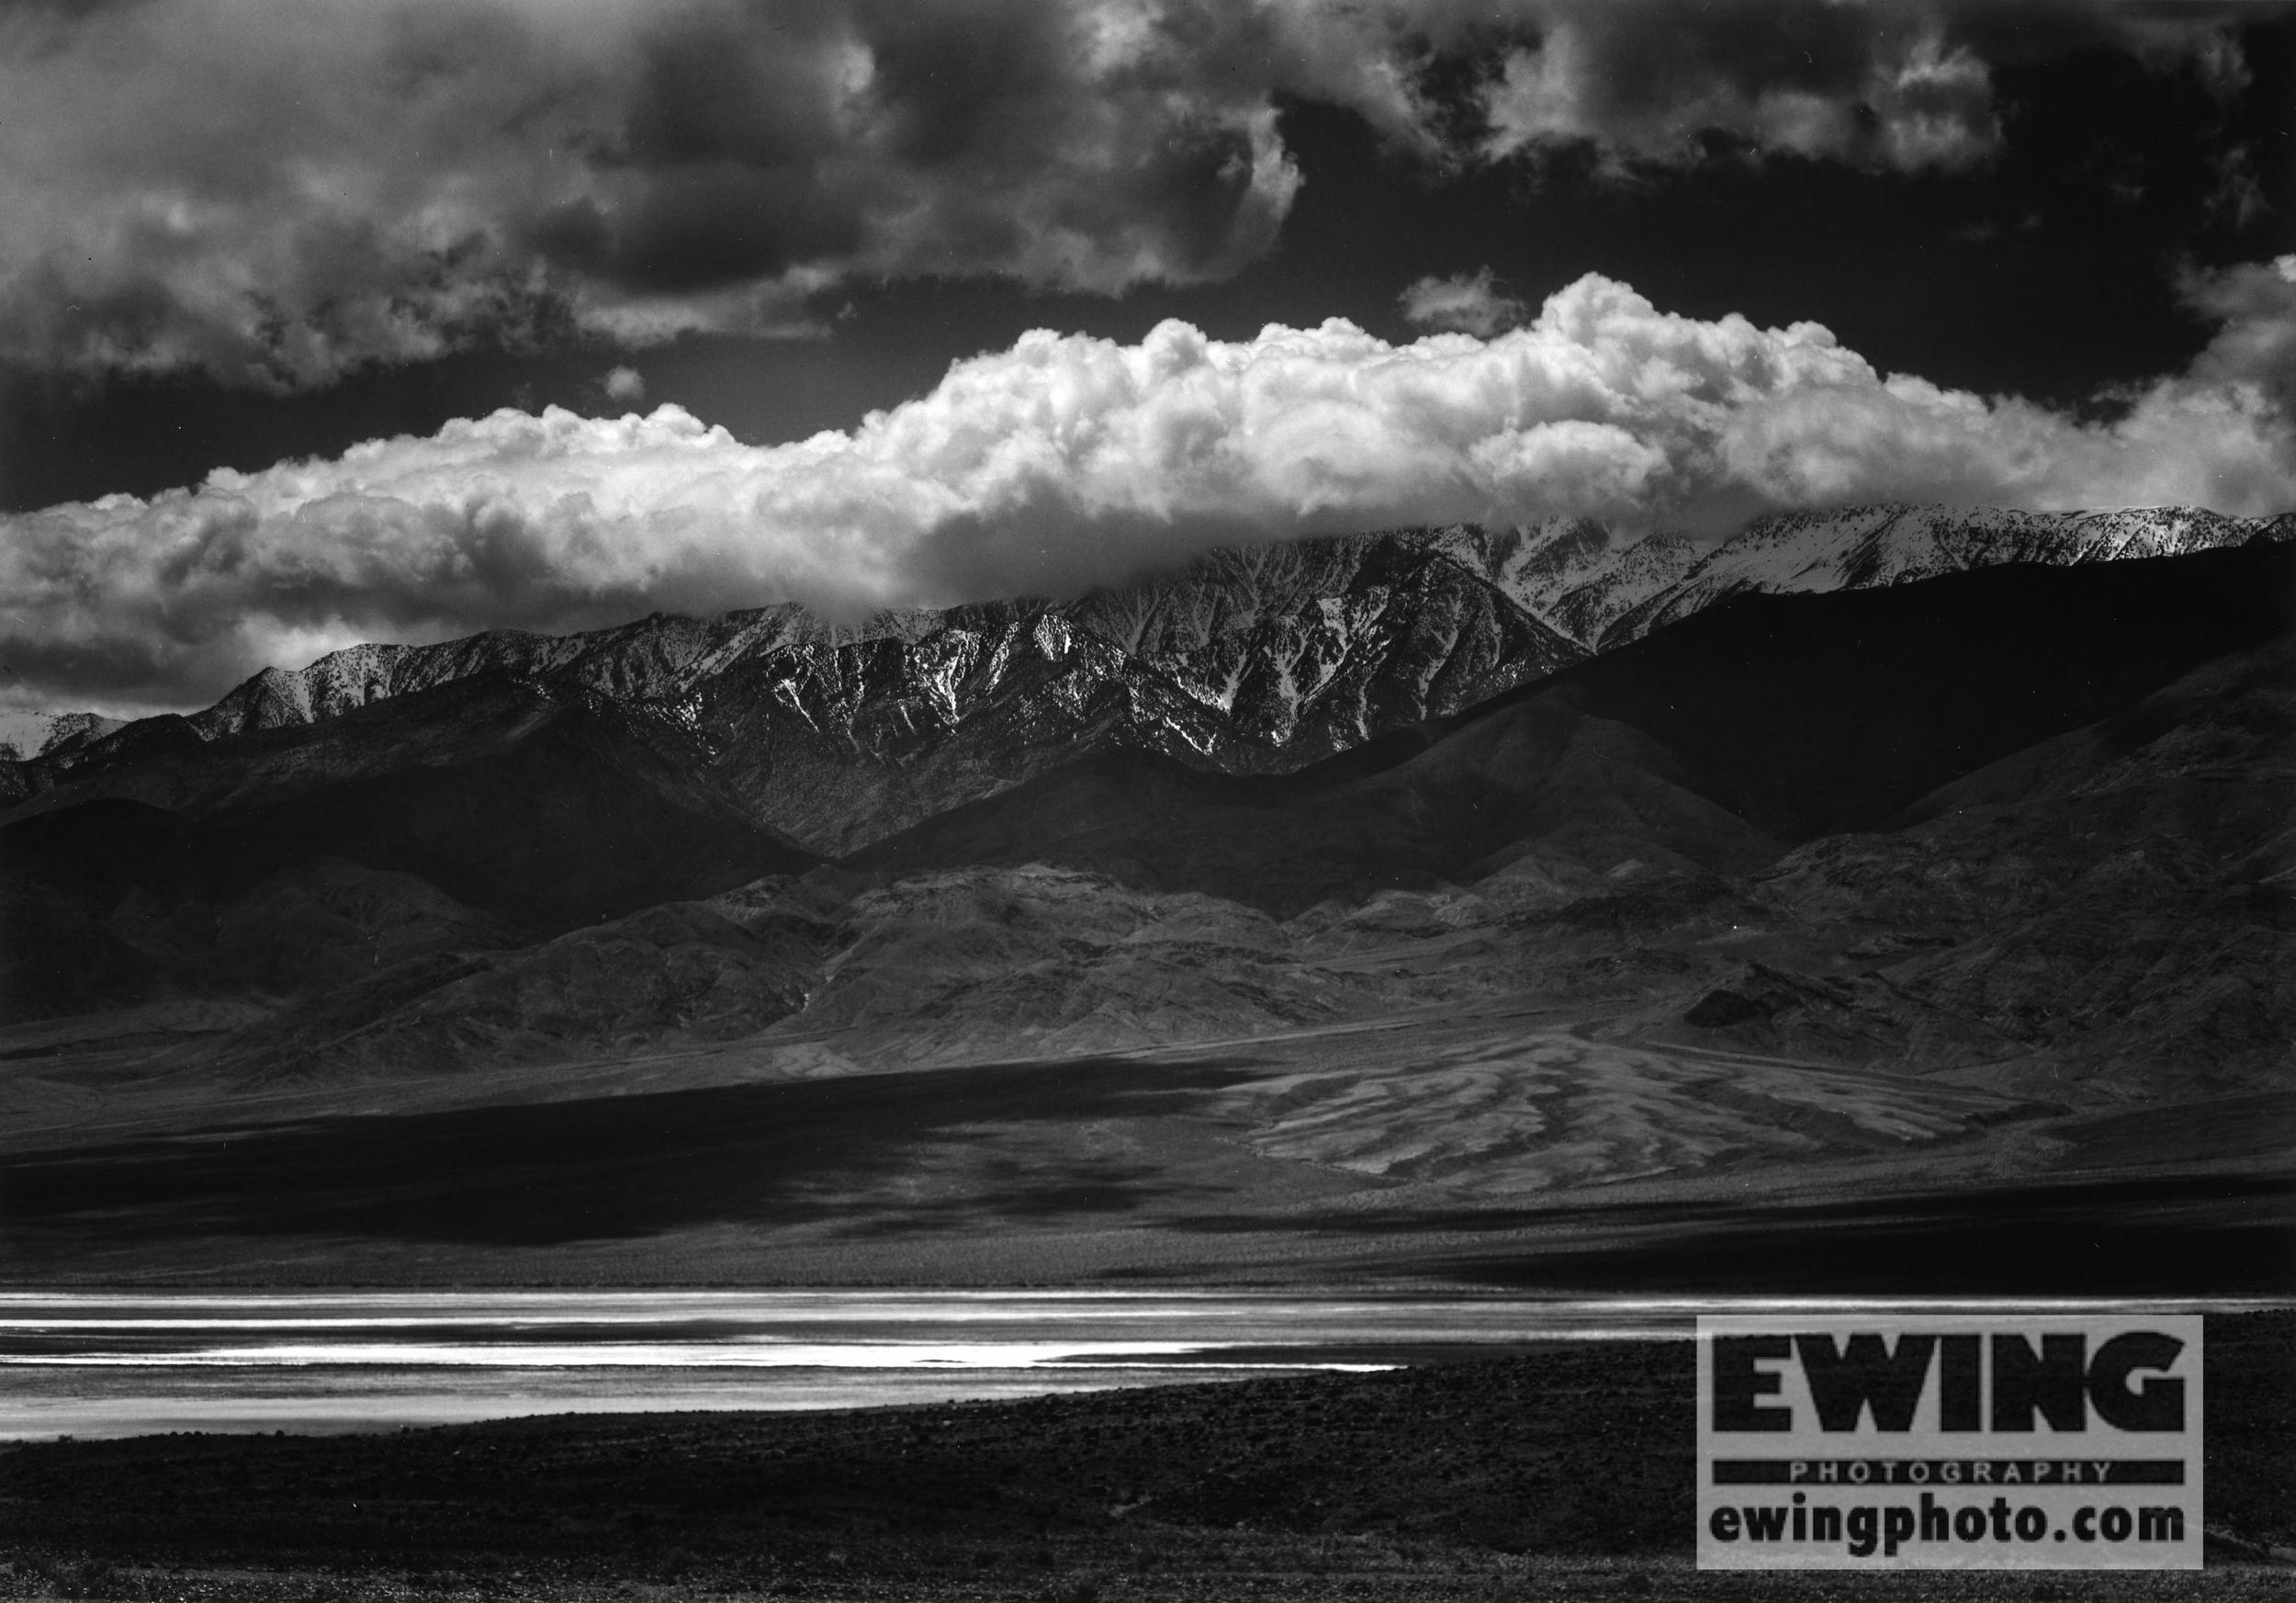 Panamint Range Death Valley, California